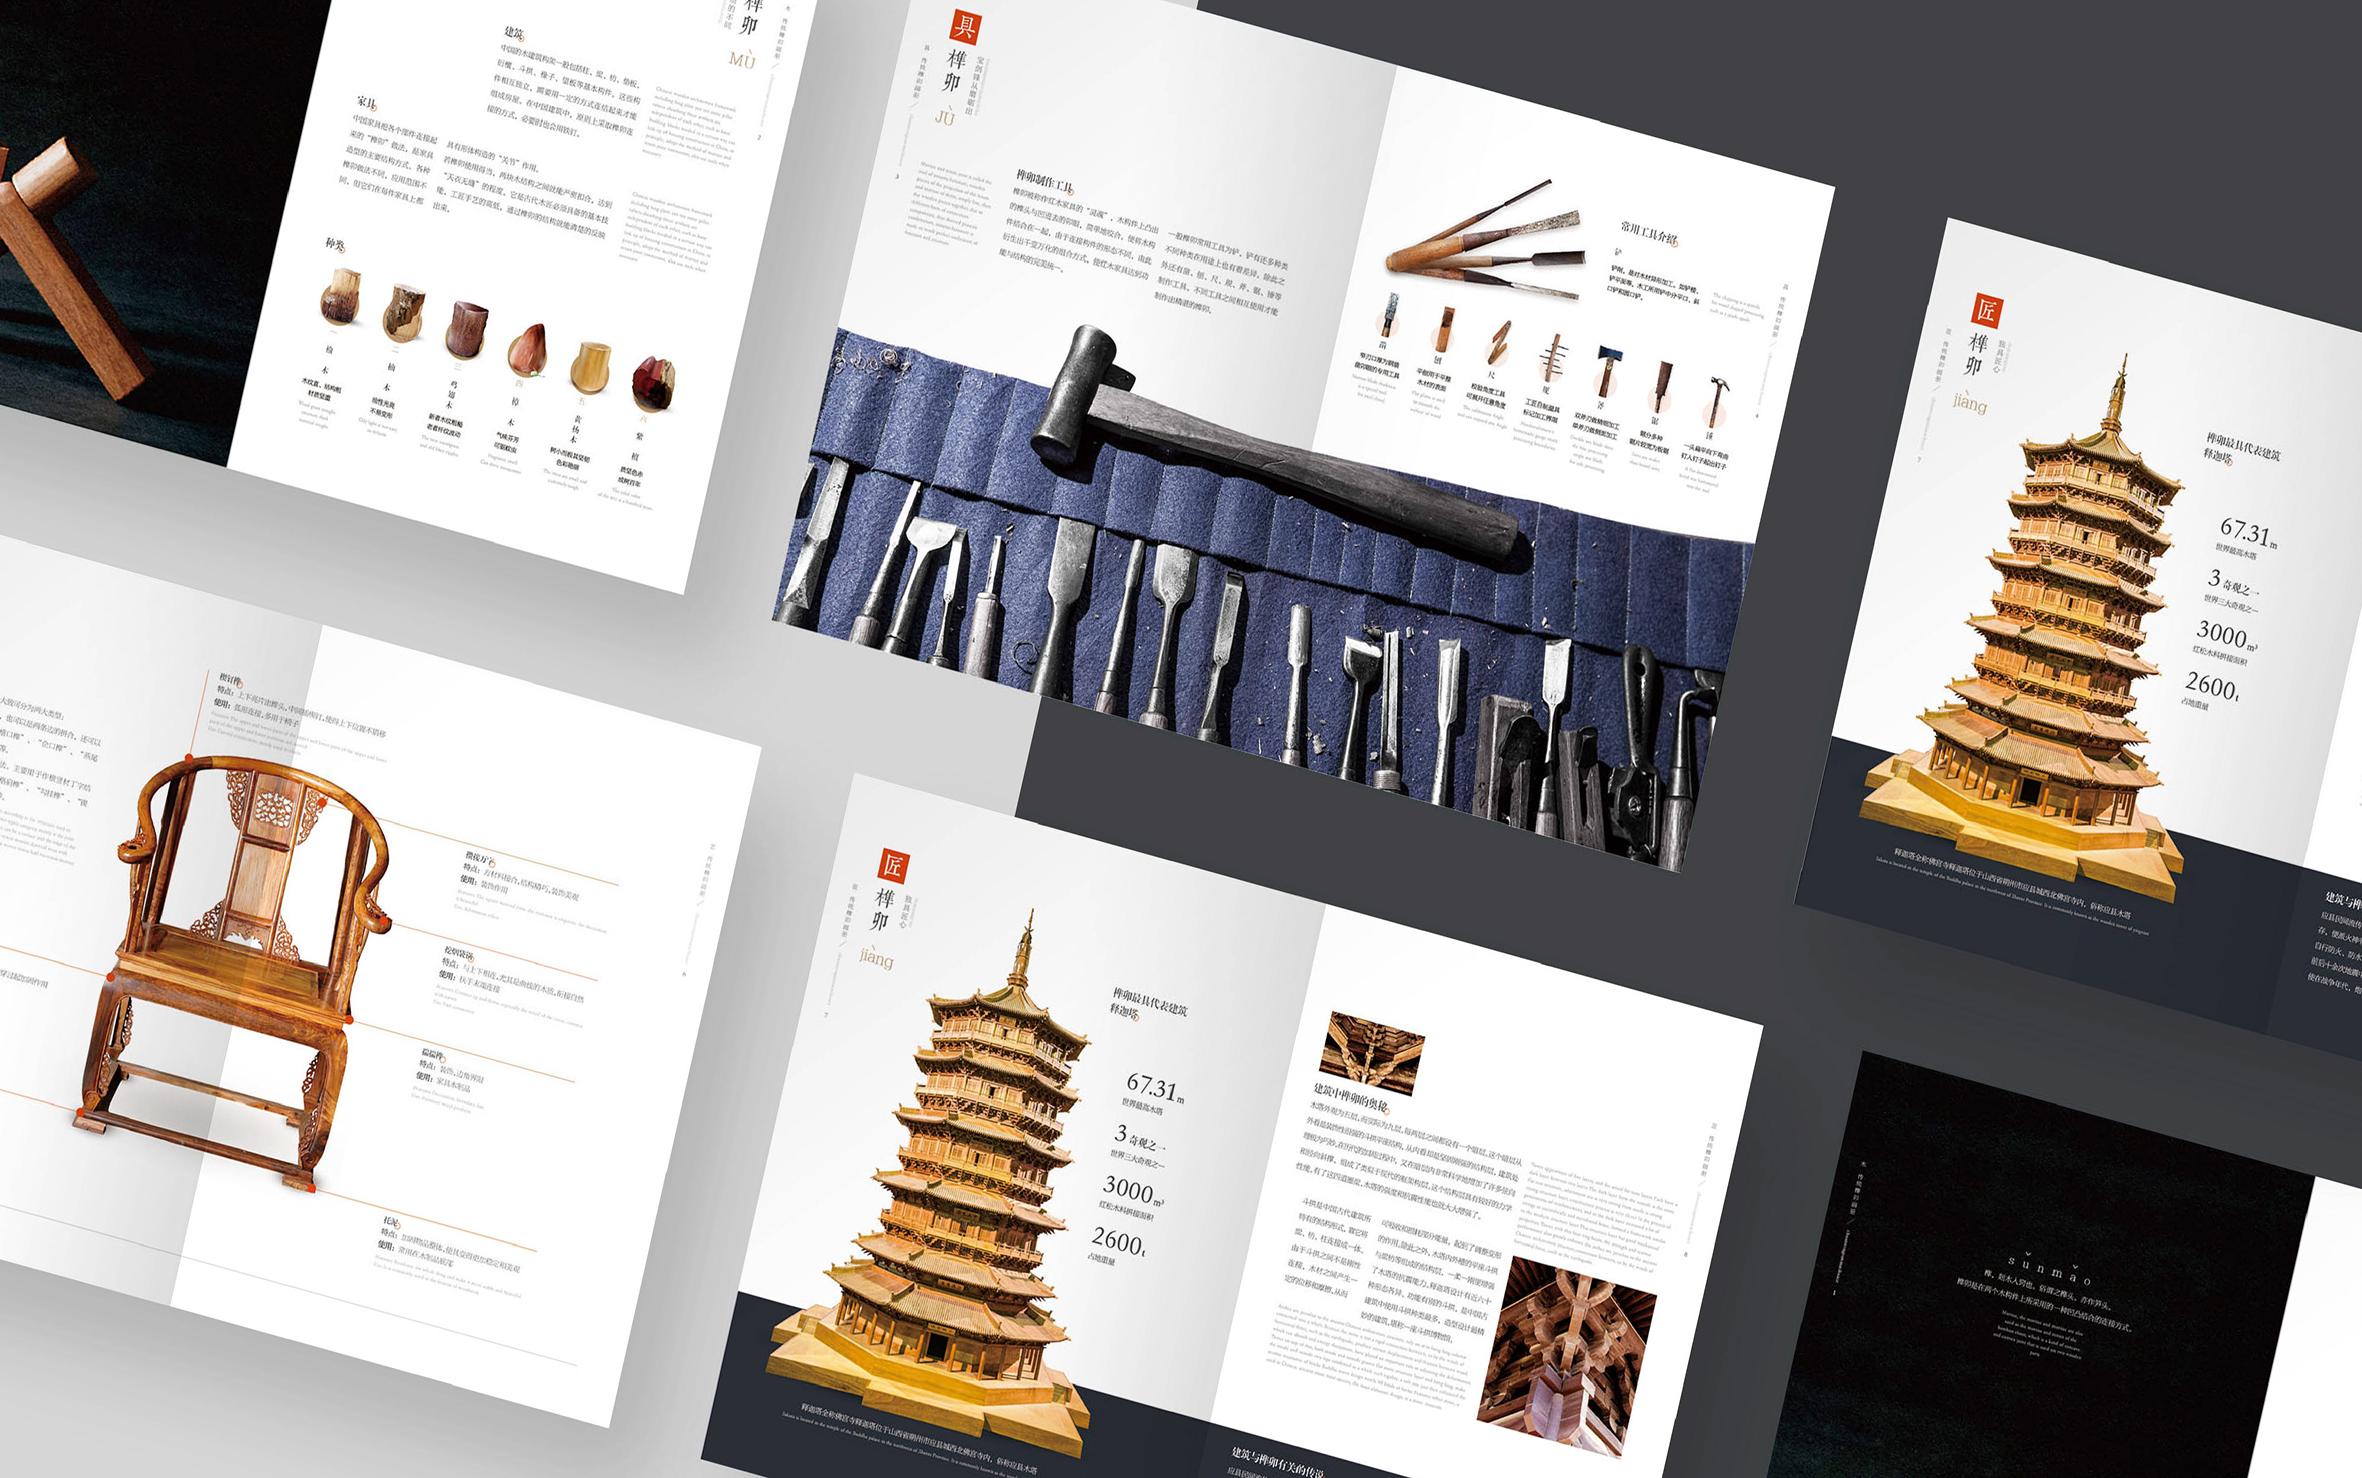 PPT设计创意产品推广商业发布会演讲工作汇报招聘年会简历画册